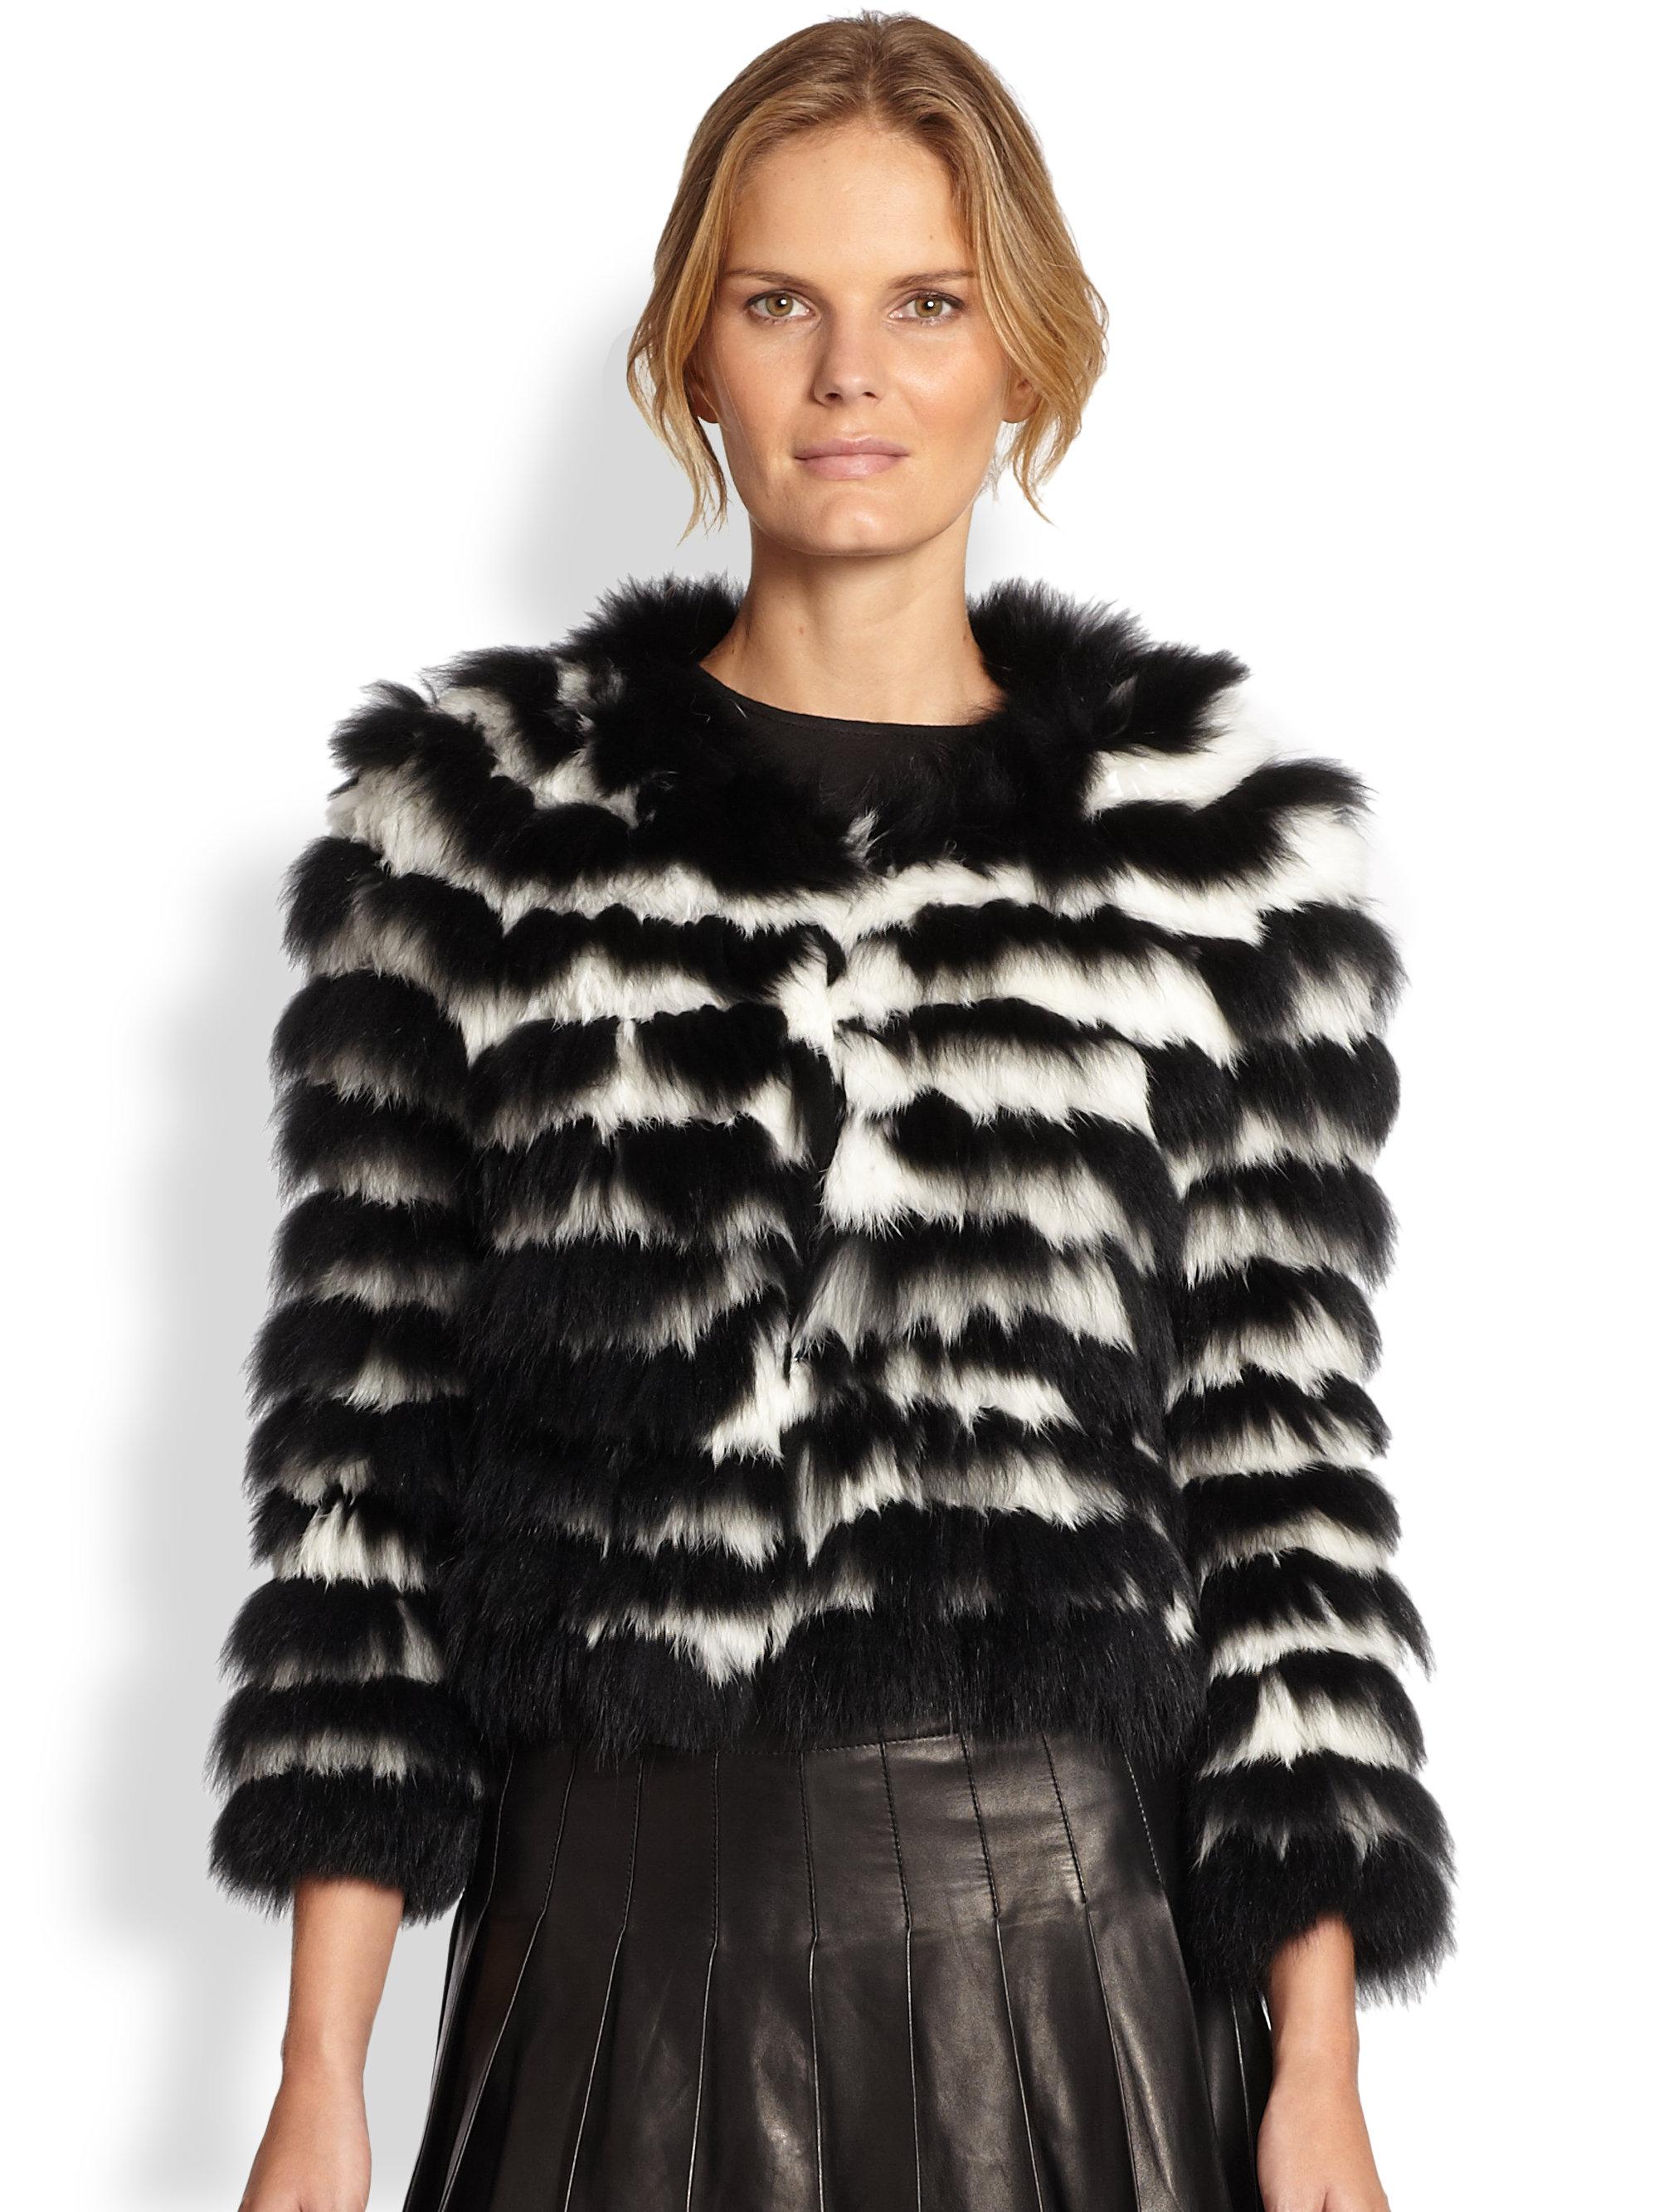 Alice + olivia Fawn Striped Fur Jacket in Black | Lyst